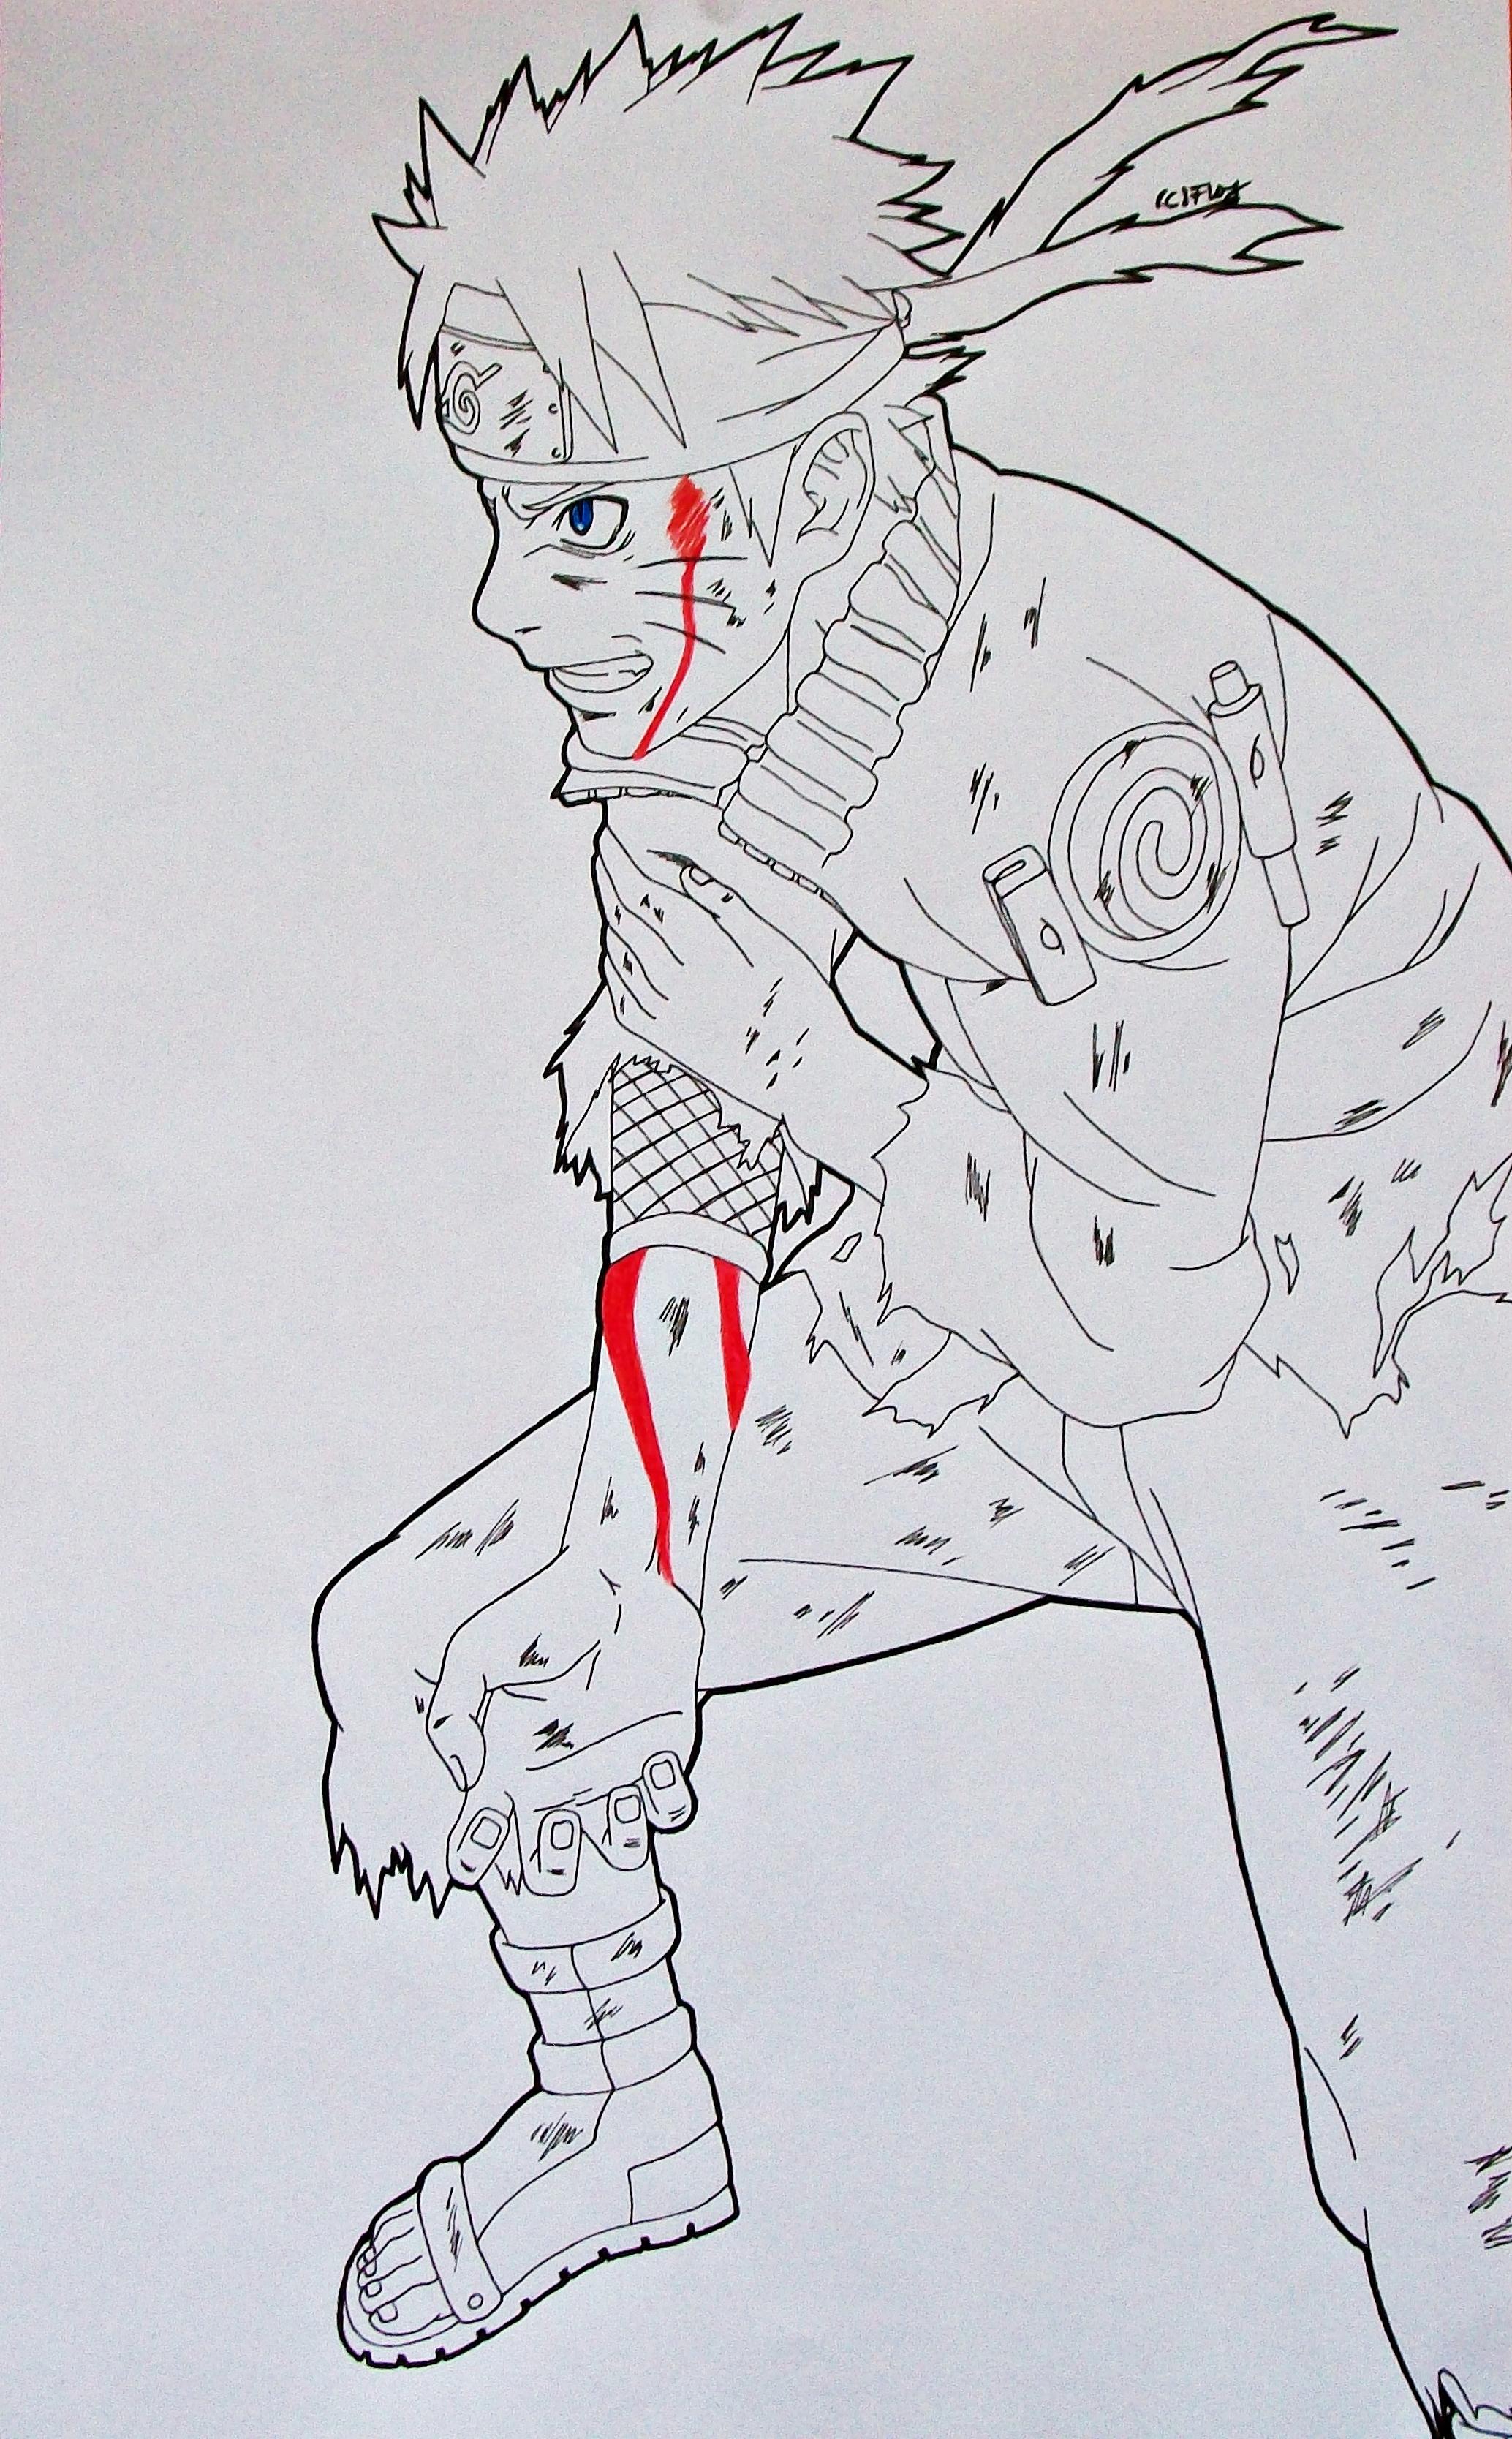 Naruto Lineart : Naruto uzumaki damaged lineart by sakakithemastermind